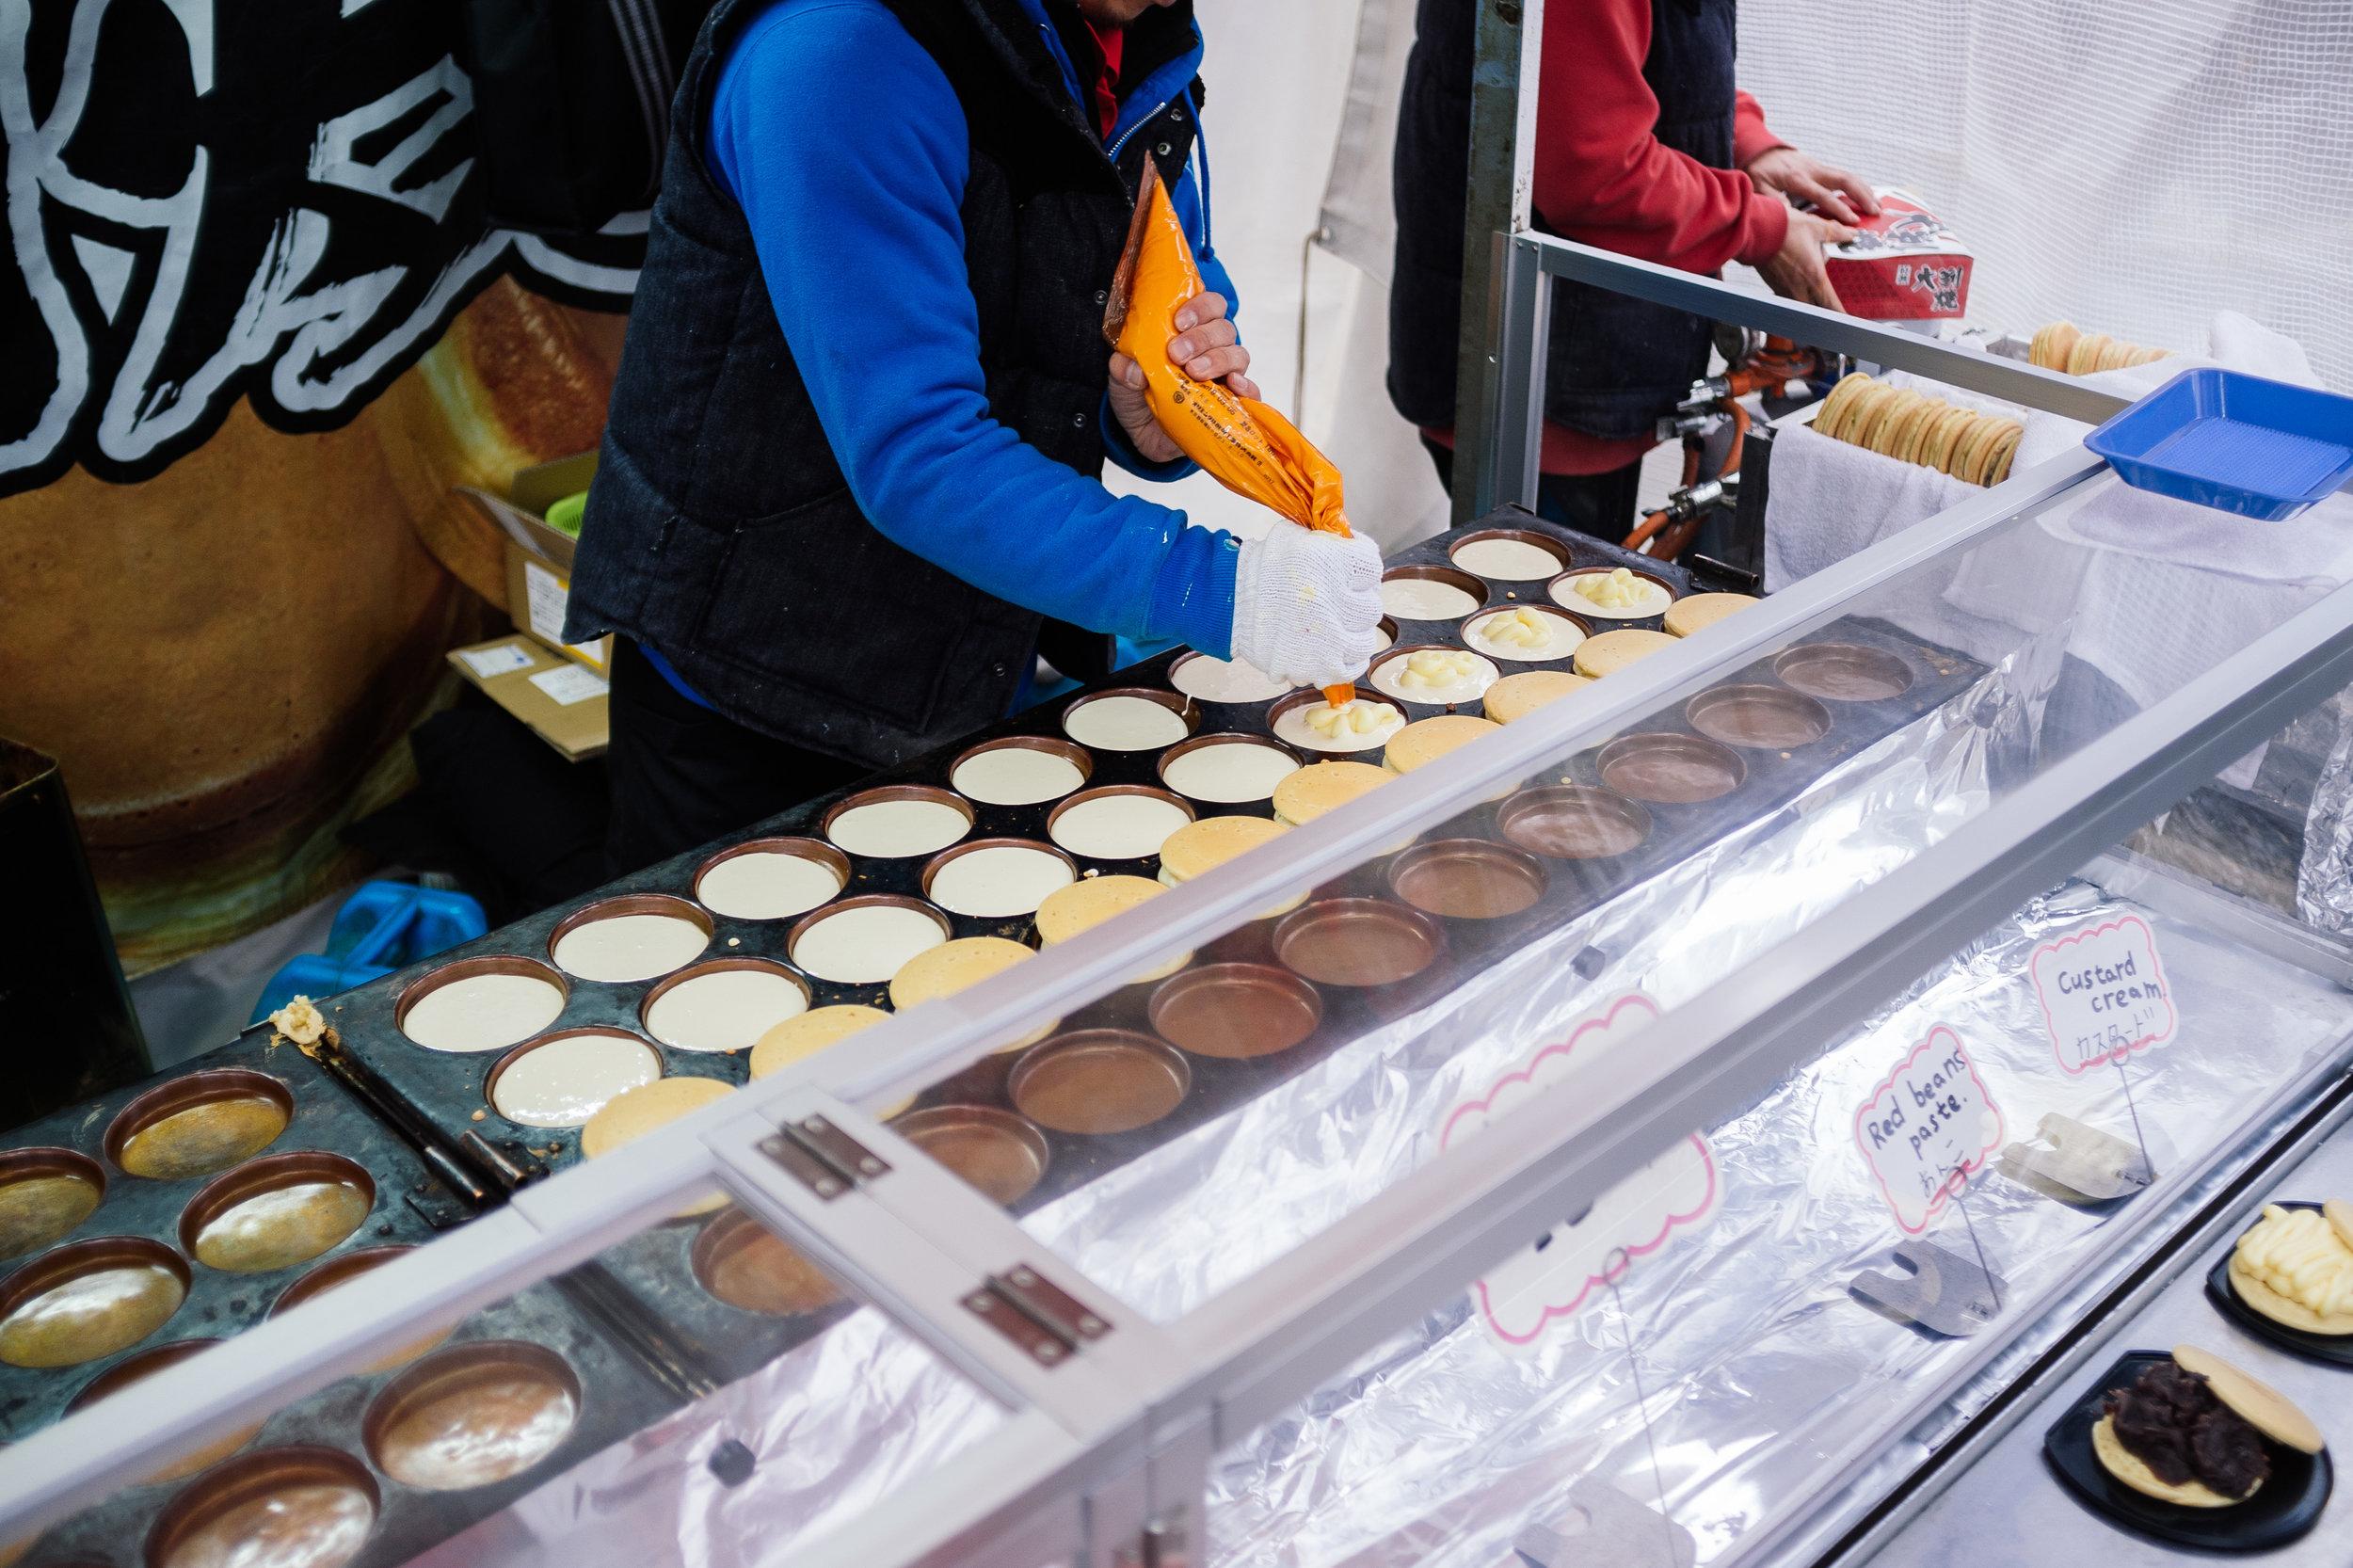 Kyoto Food Stall Cakes 2.jpg